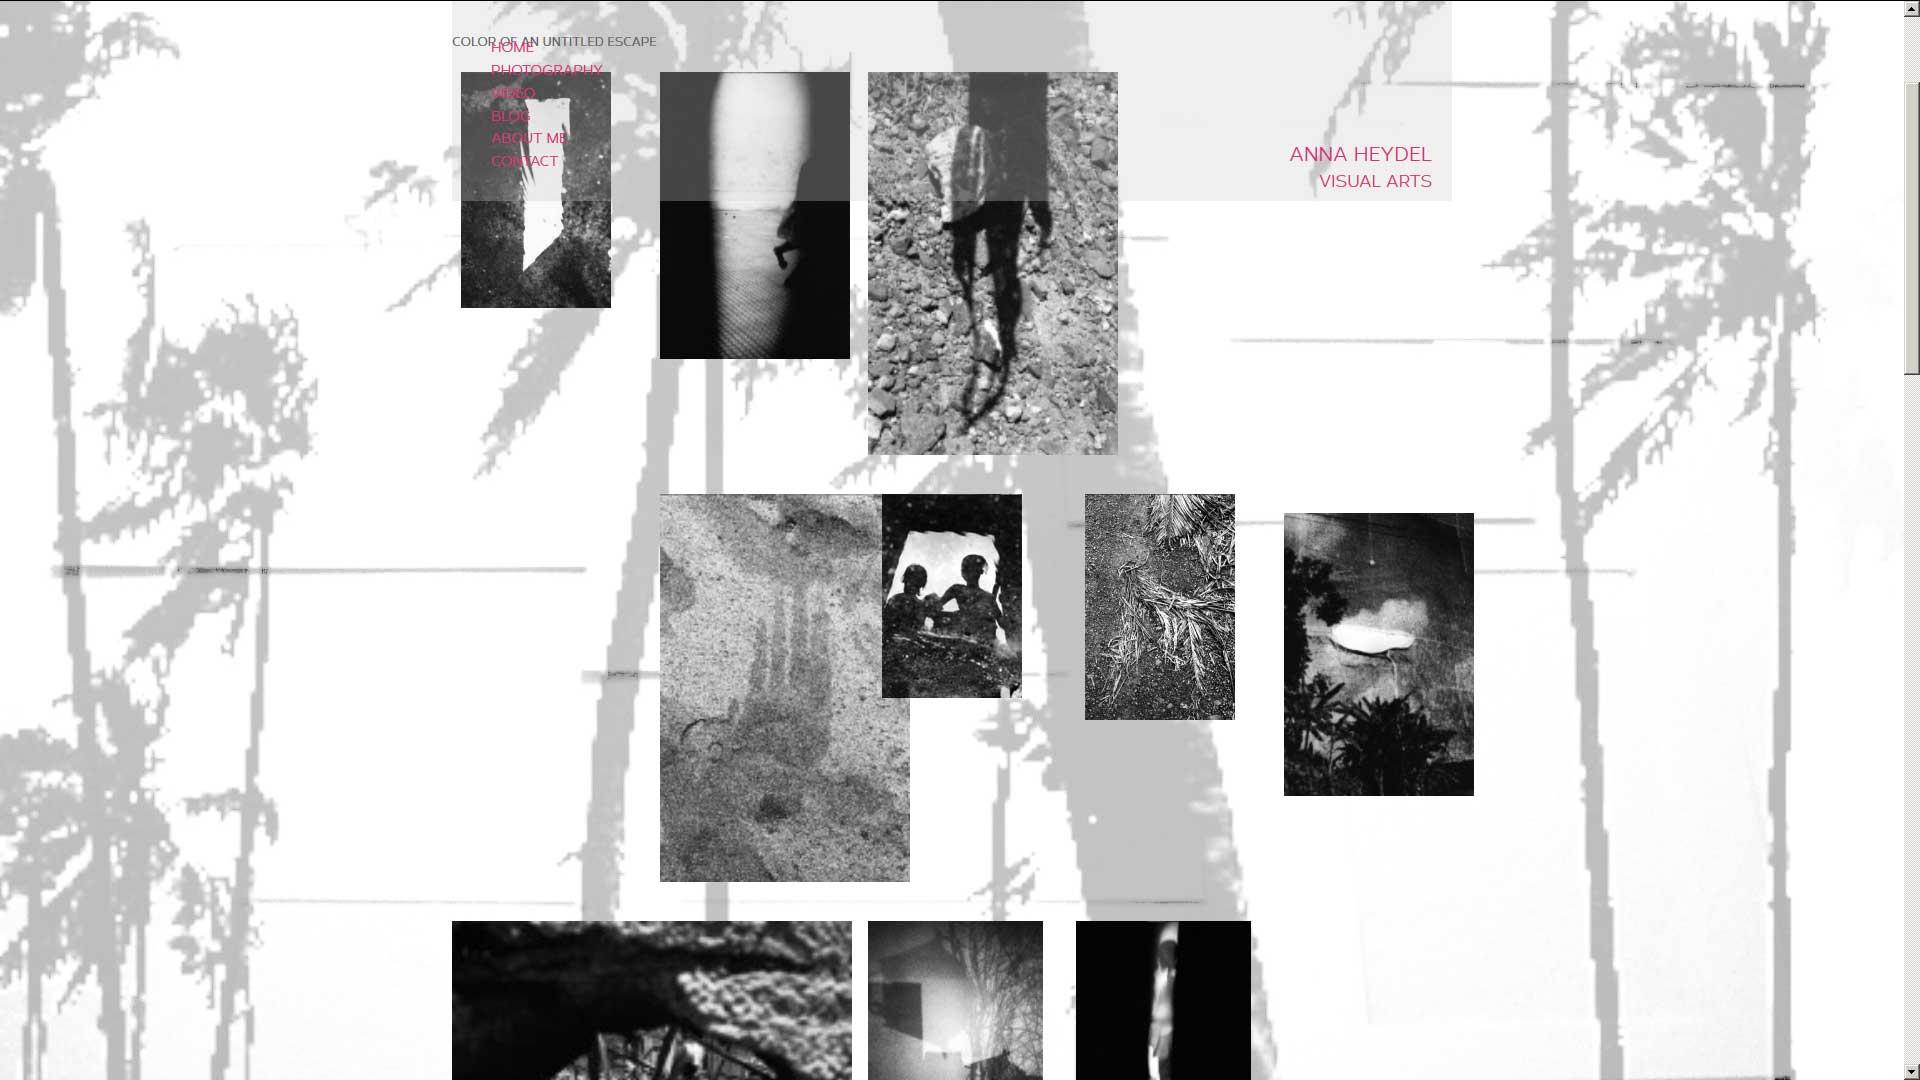 webgestaltung-annaheydel-visual-arts-webseite